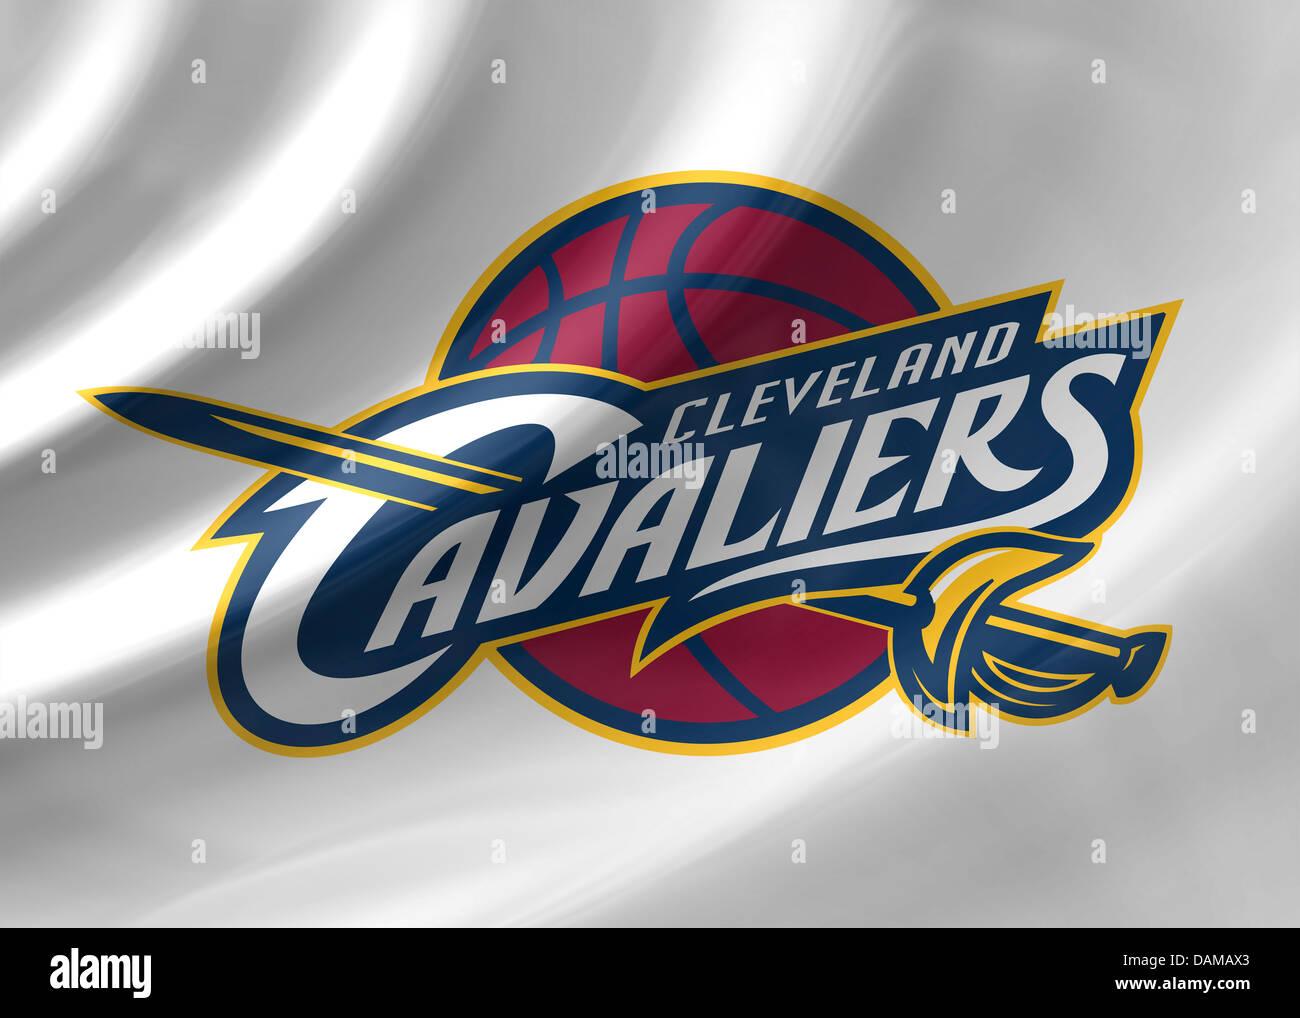 Cleveland Cavaliers Logo Icon Stock Photos Cleveland Cavaliers